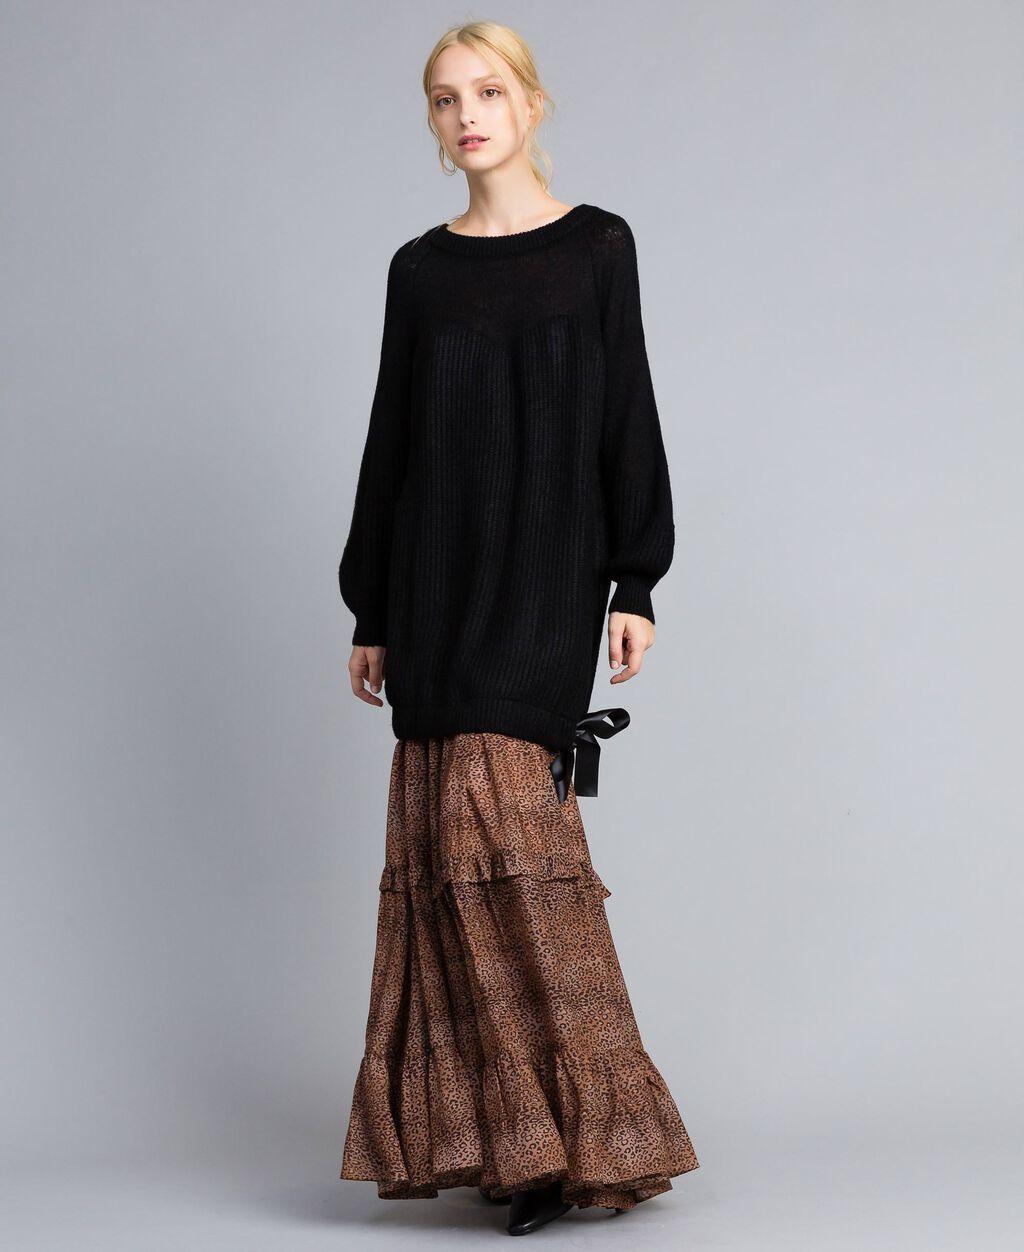 b8691a4e35f Мини-платье из смешанного мохера женщина